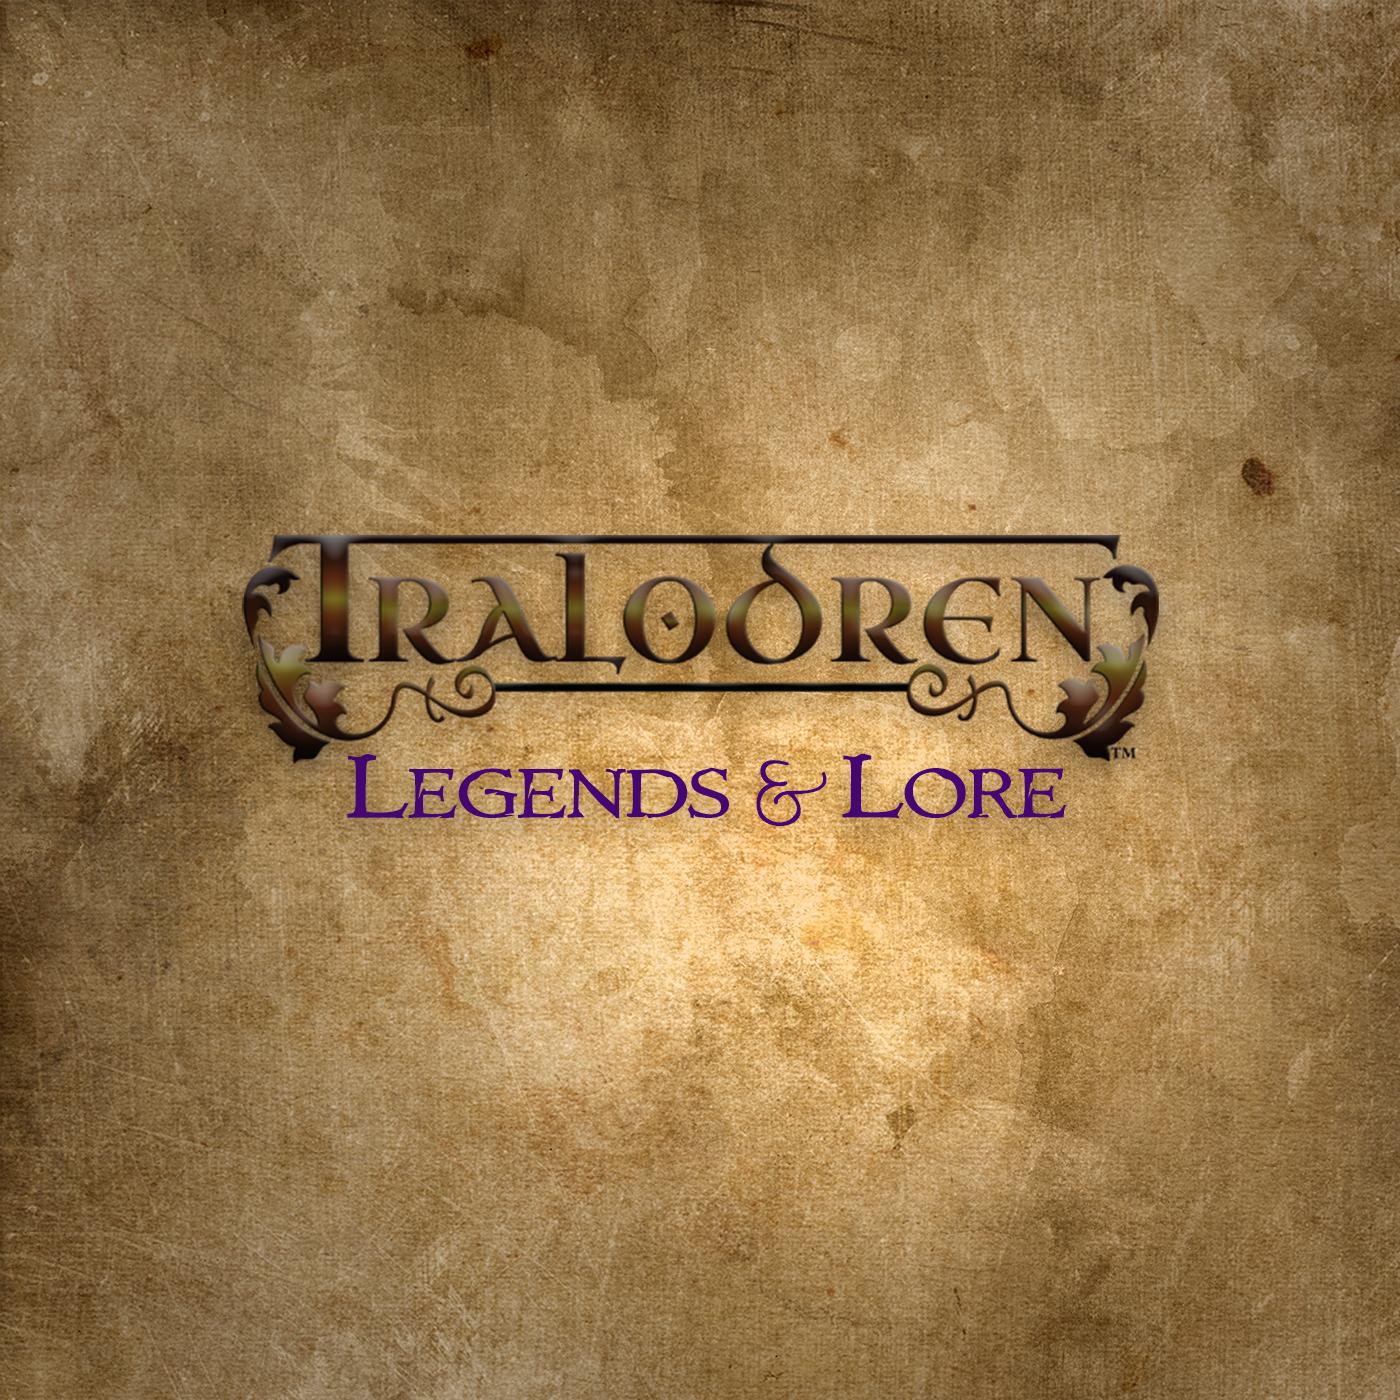 Tralodren: Legends and Lore